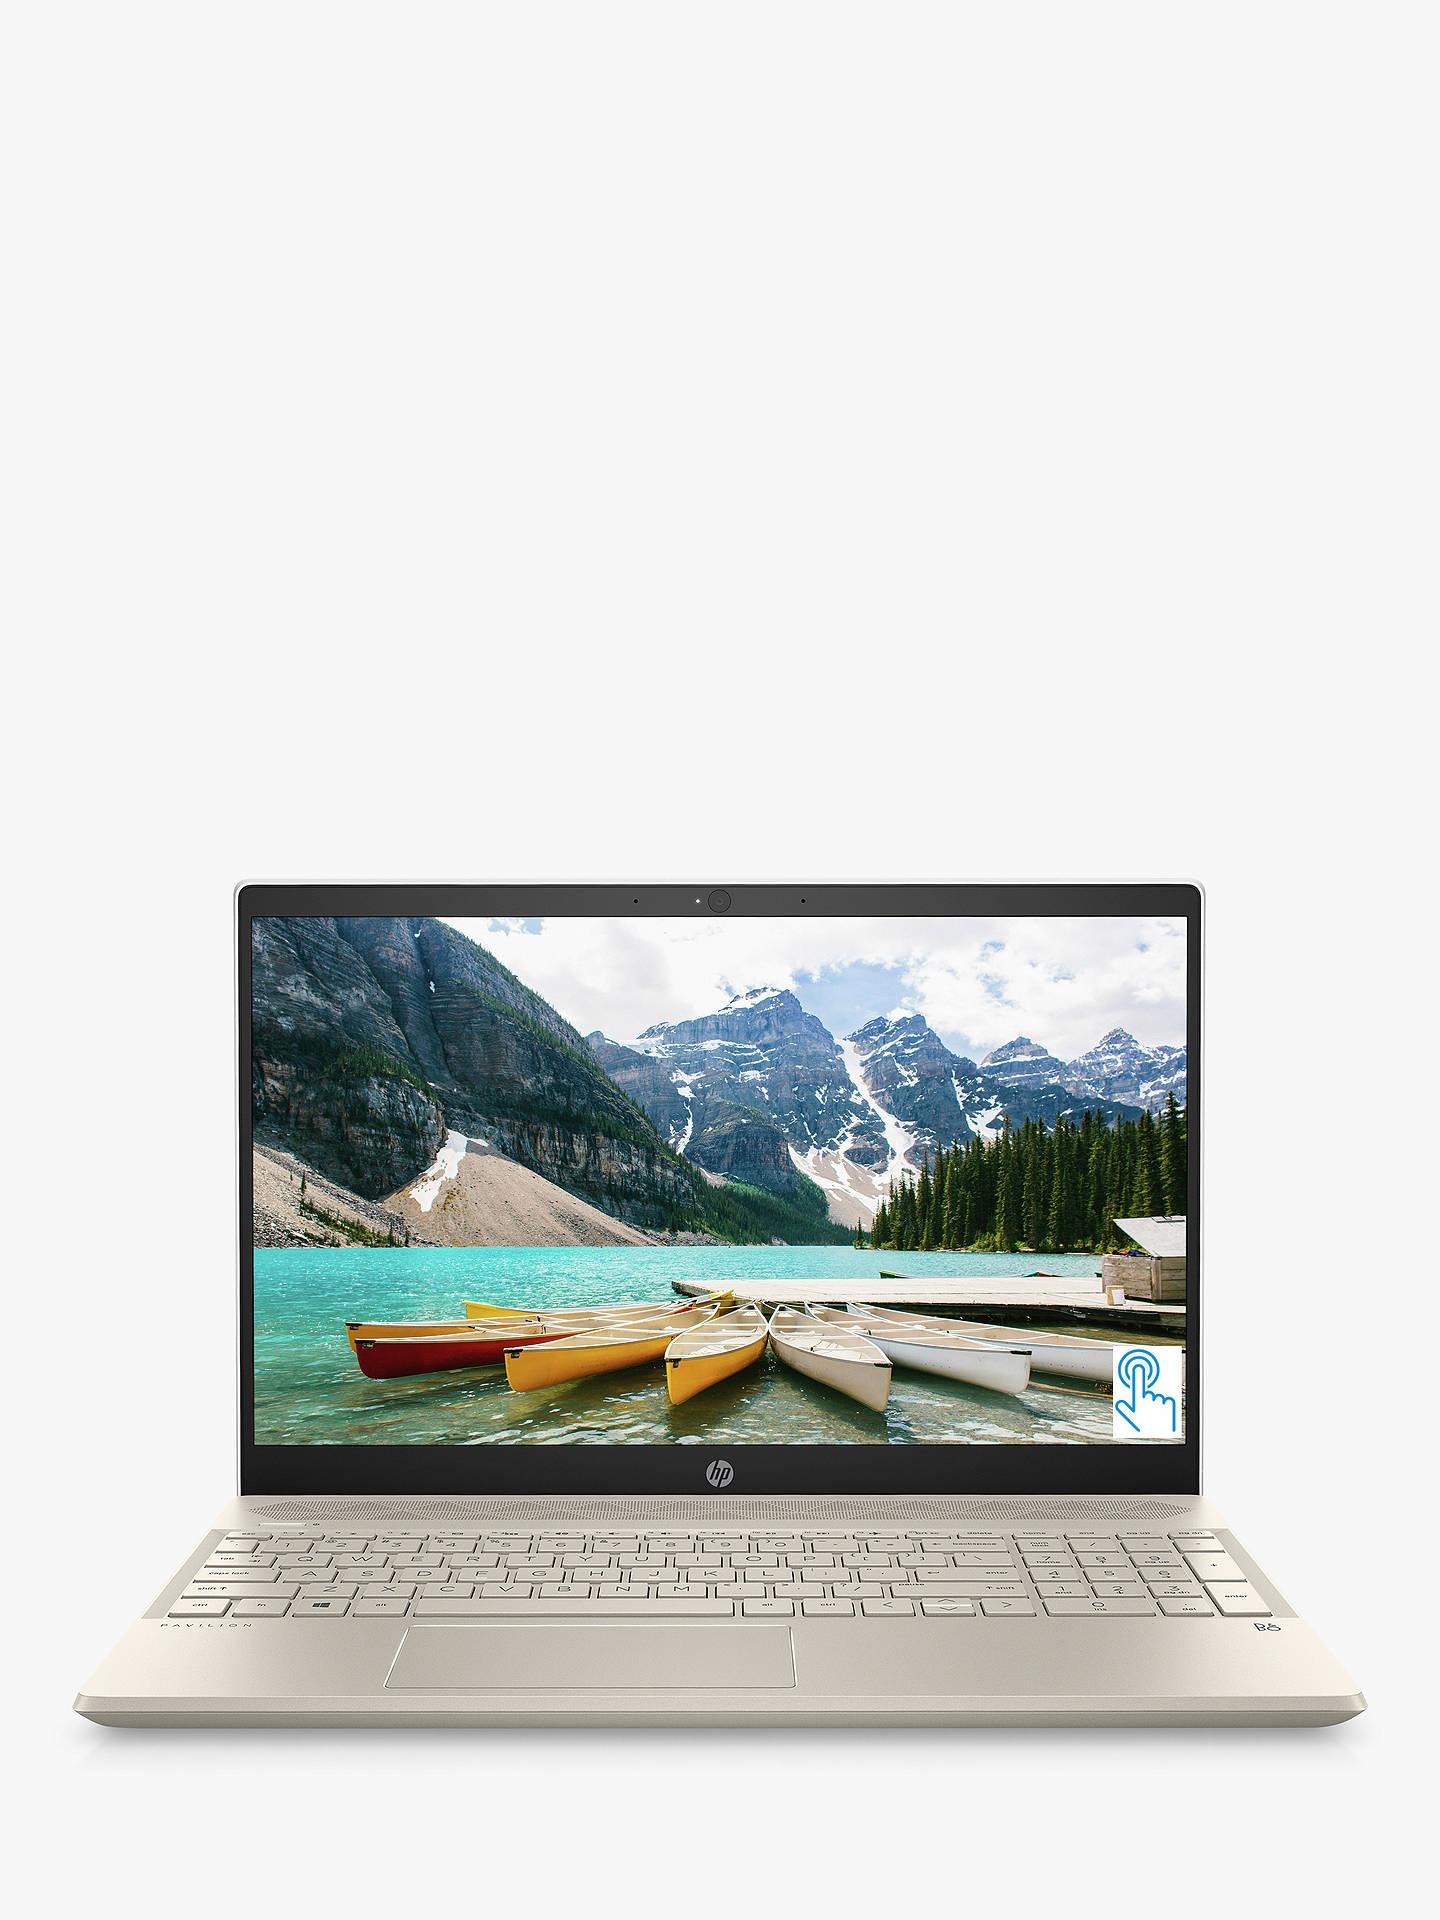 HP Pavilion 15-cw0013na Laptop, AMD A9 Processor, 4GB RAM, 128GB SSD, 15 6